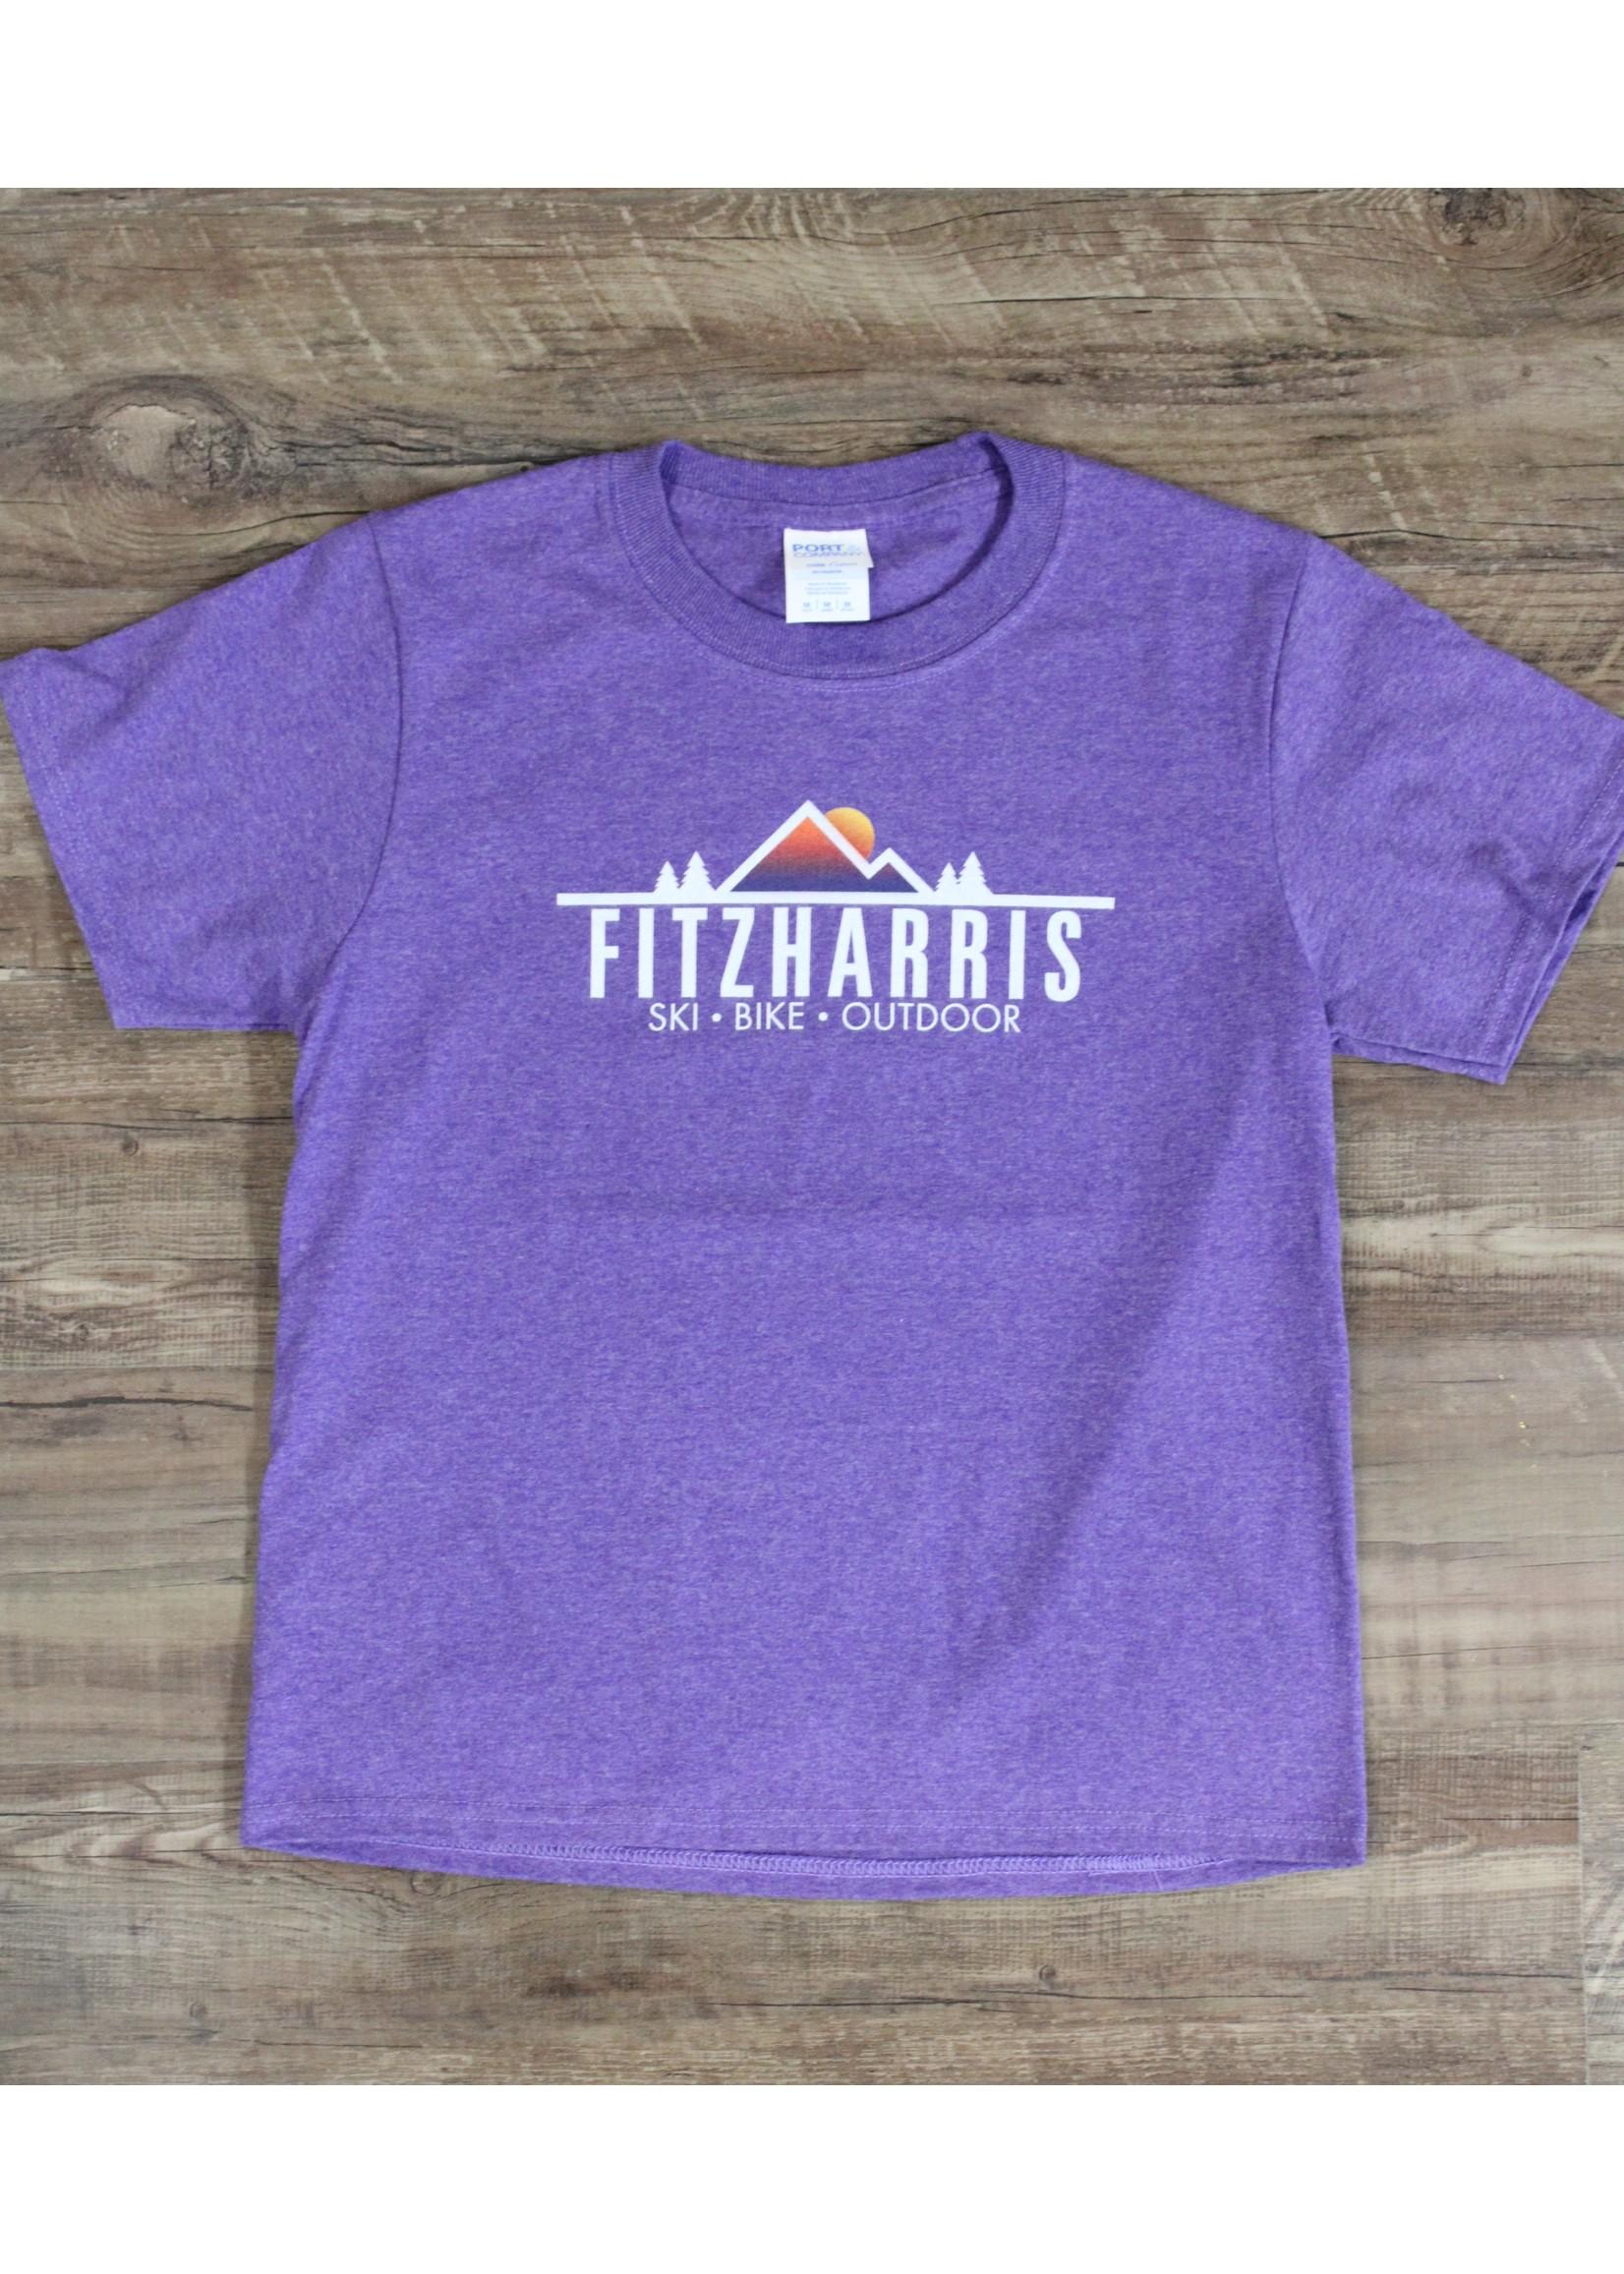 Fitzharris Fitz Youth SS Tee Shirt